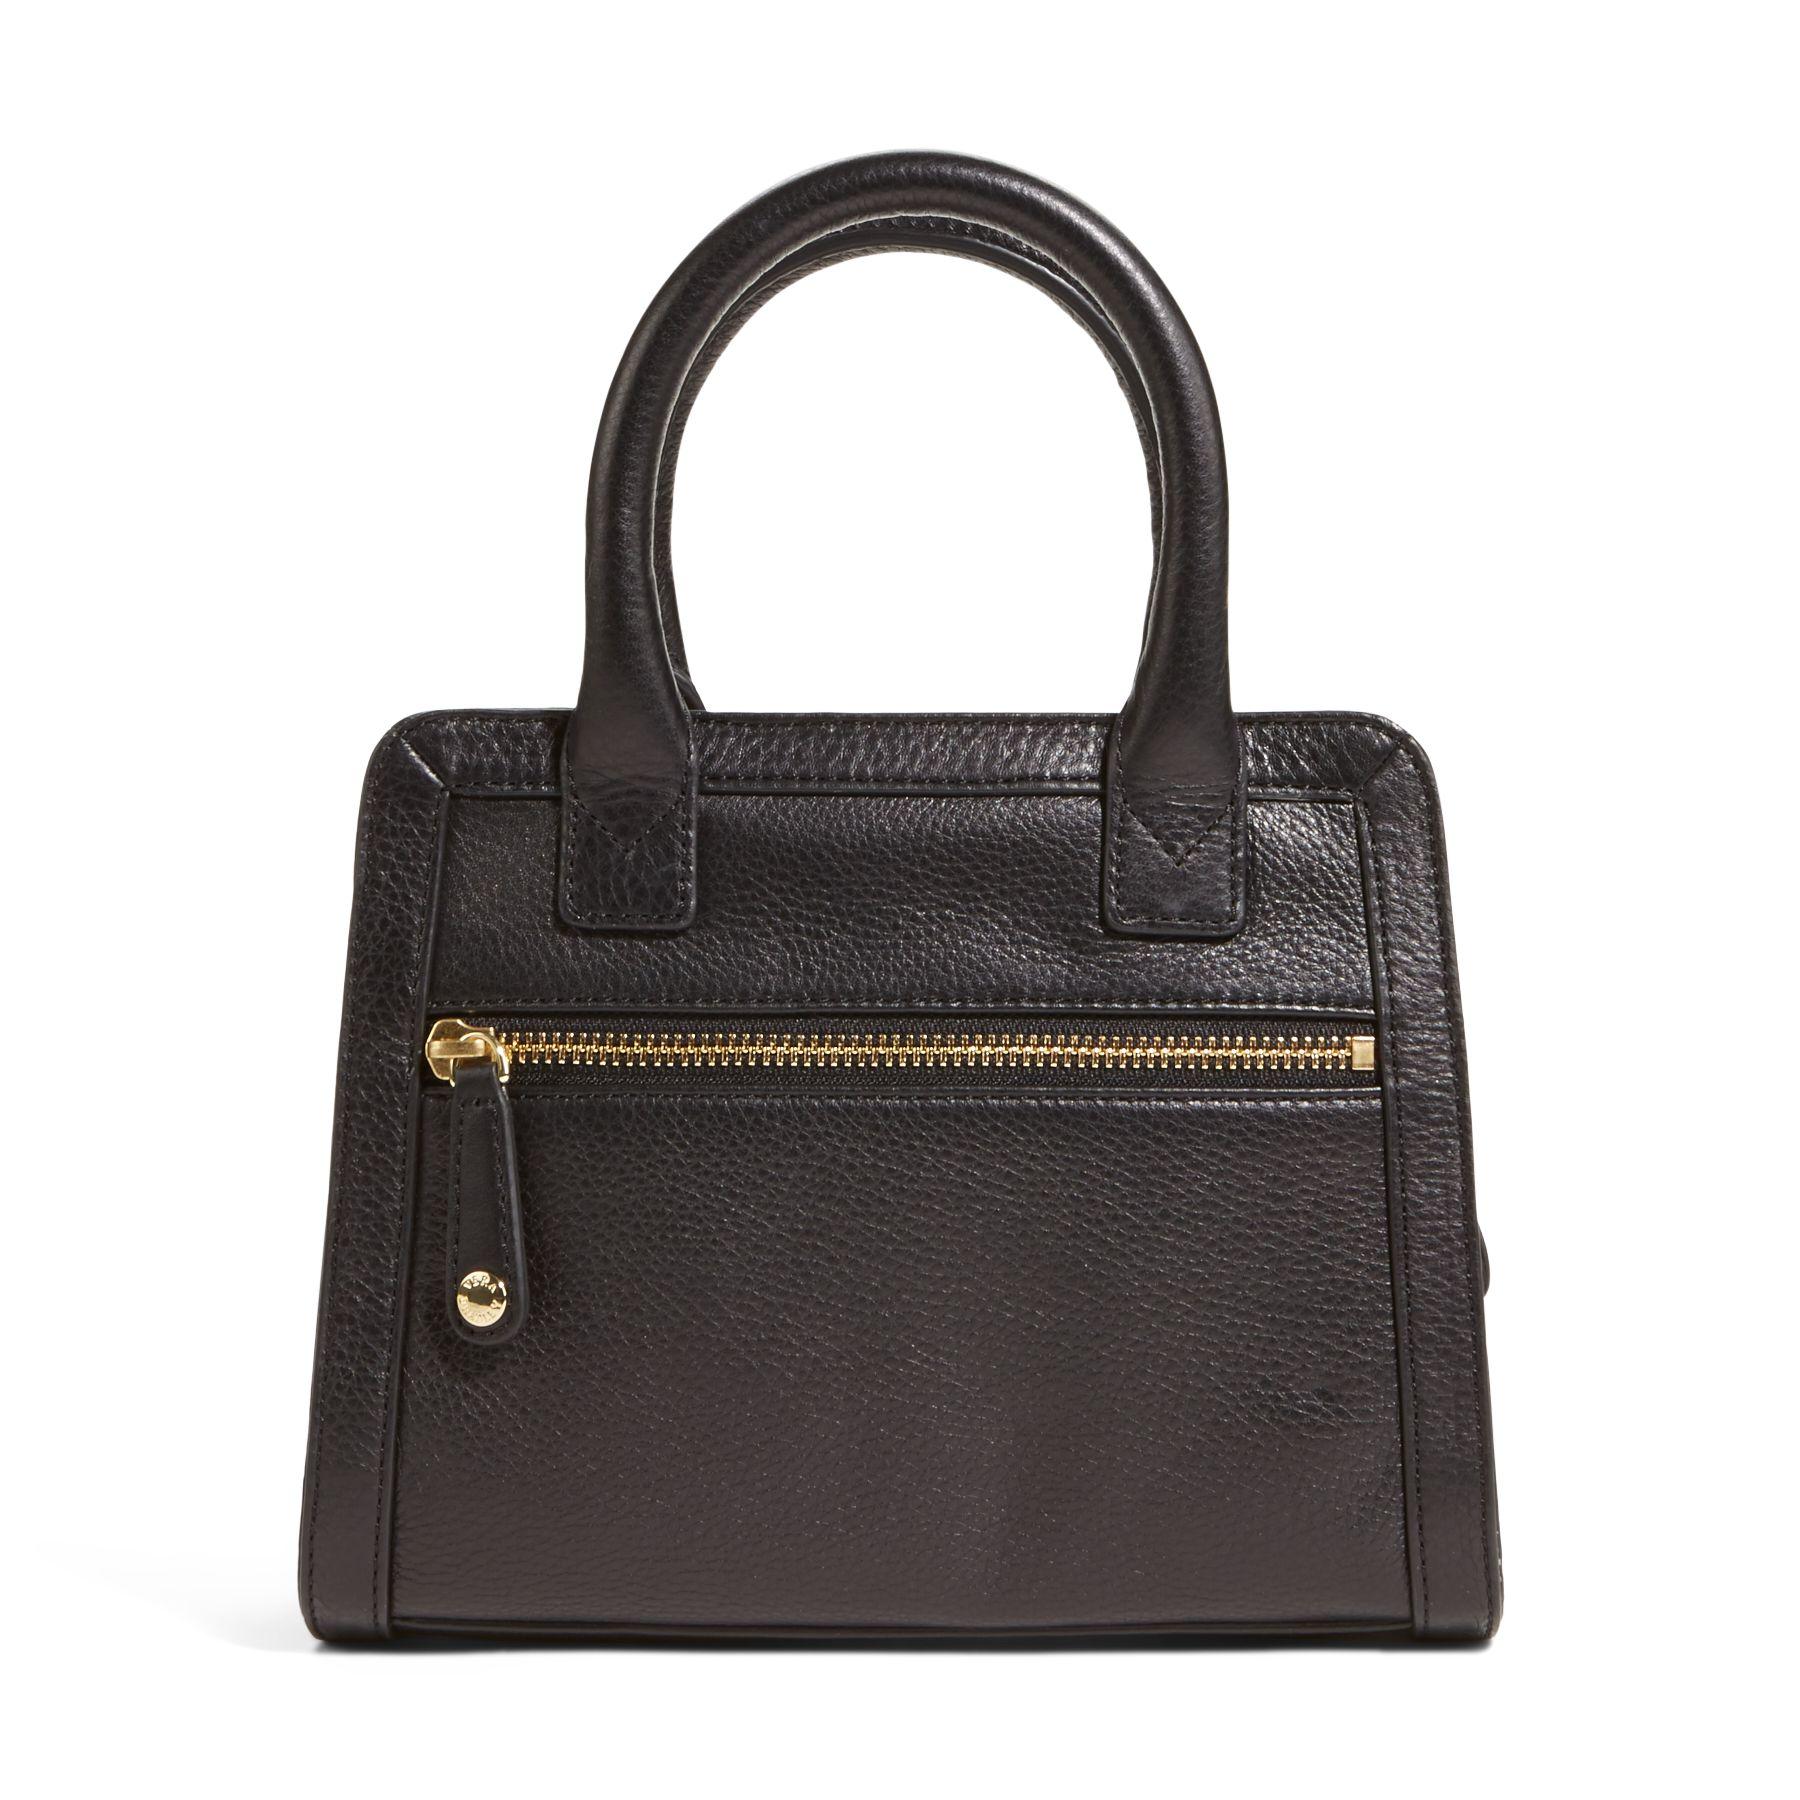 Vera Bradley Leather Natalie Crossbody Bag